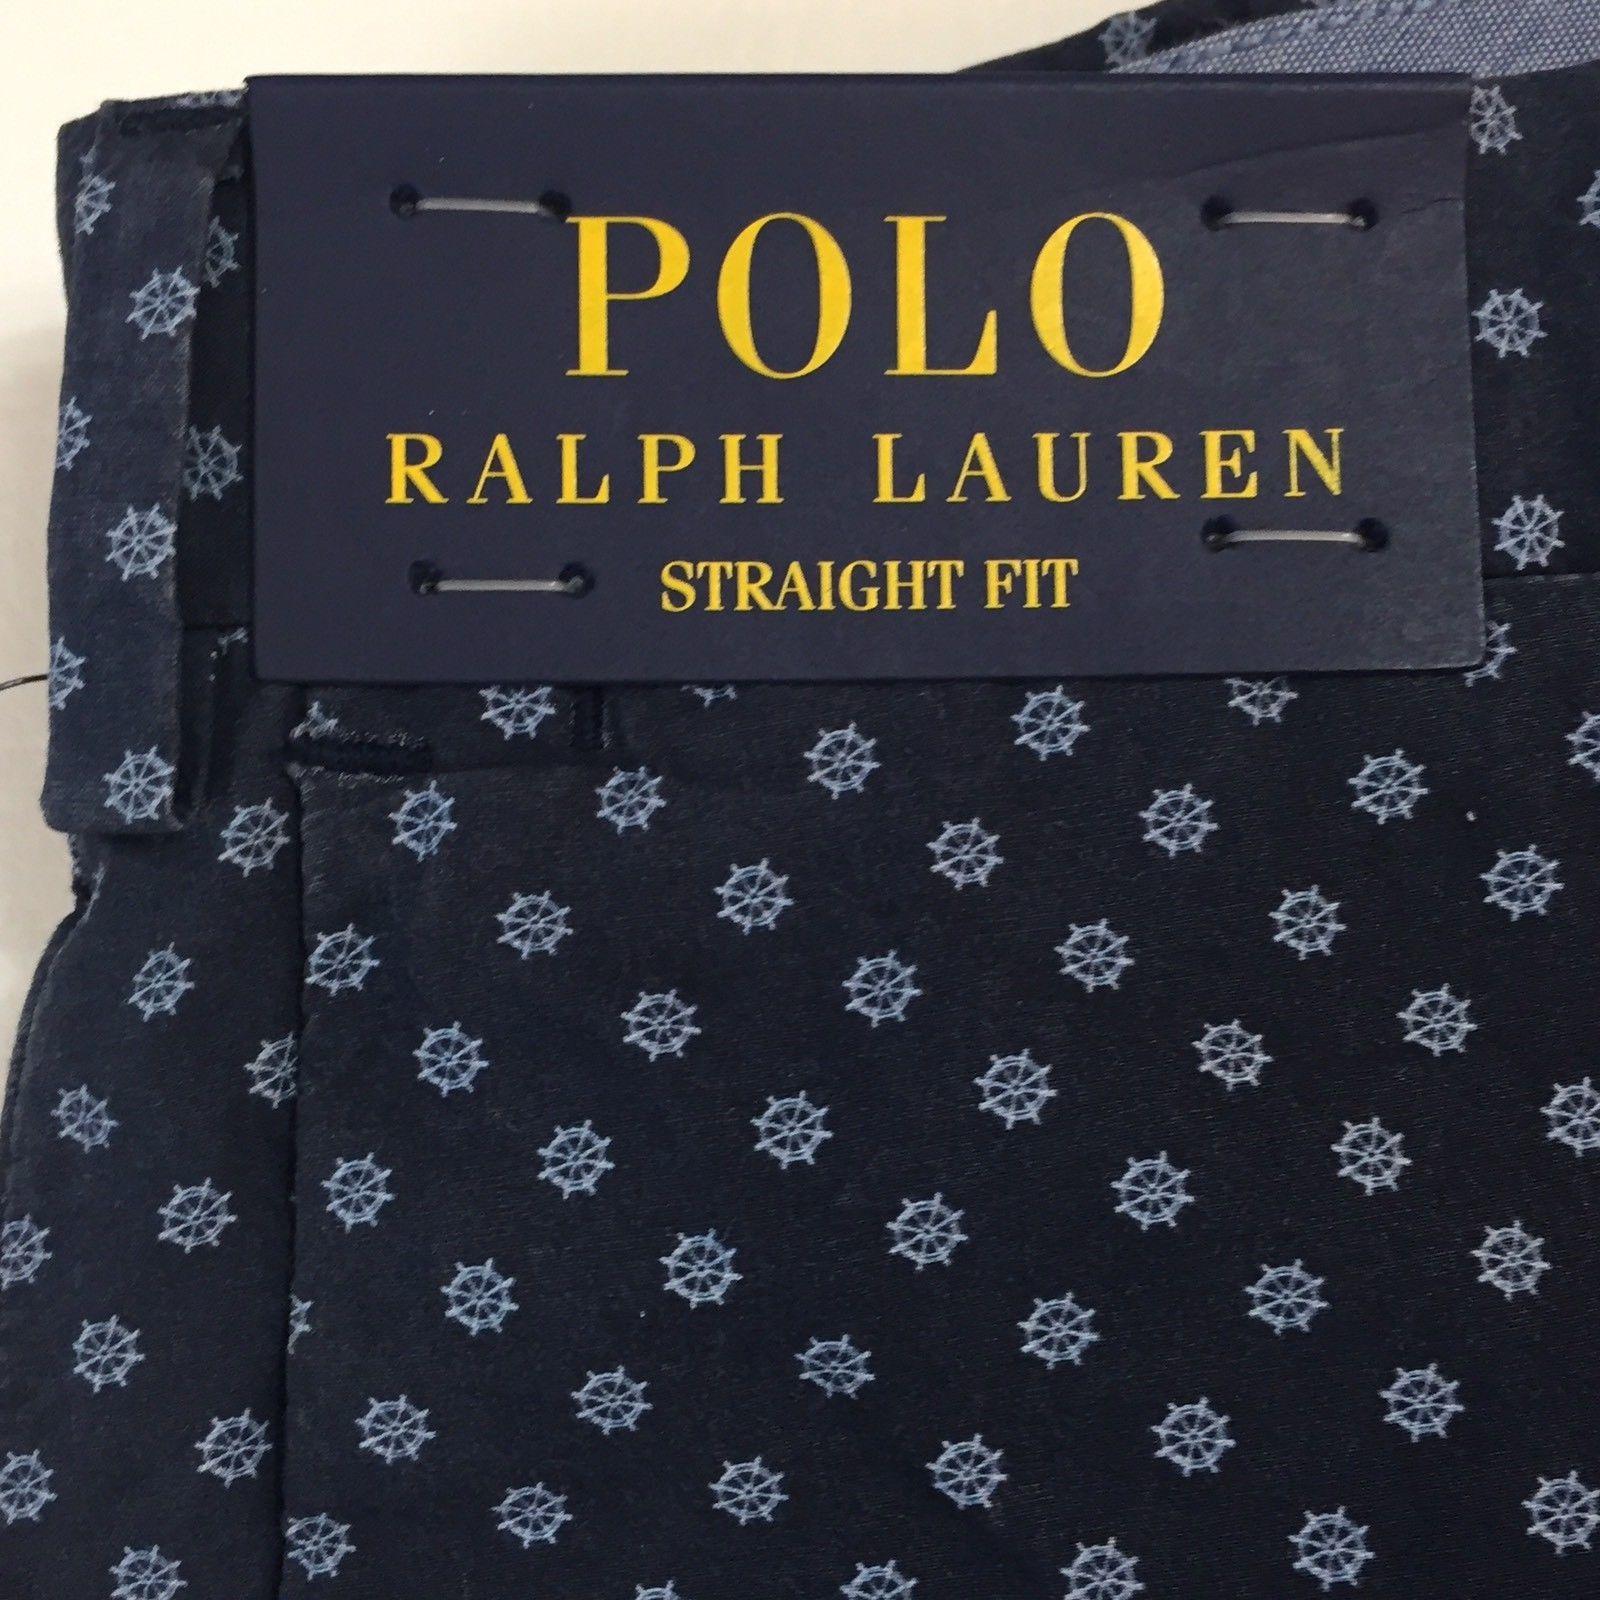 Polo Ralph Lauren Straight Fit Navy Blue Ship wheel Black Watch Shorts NWT Sz 33